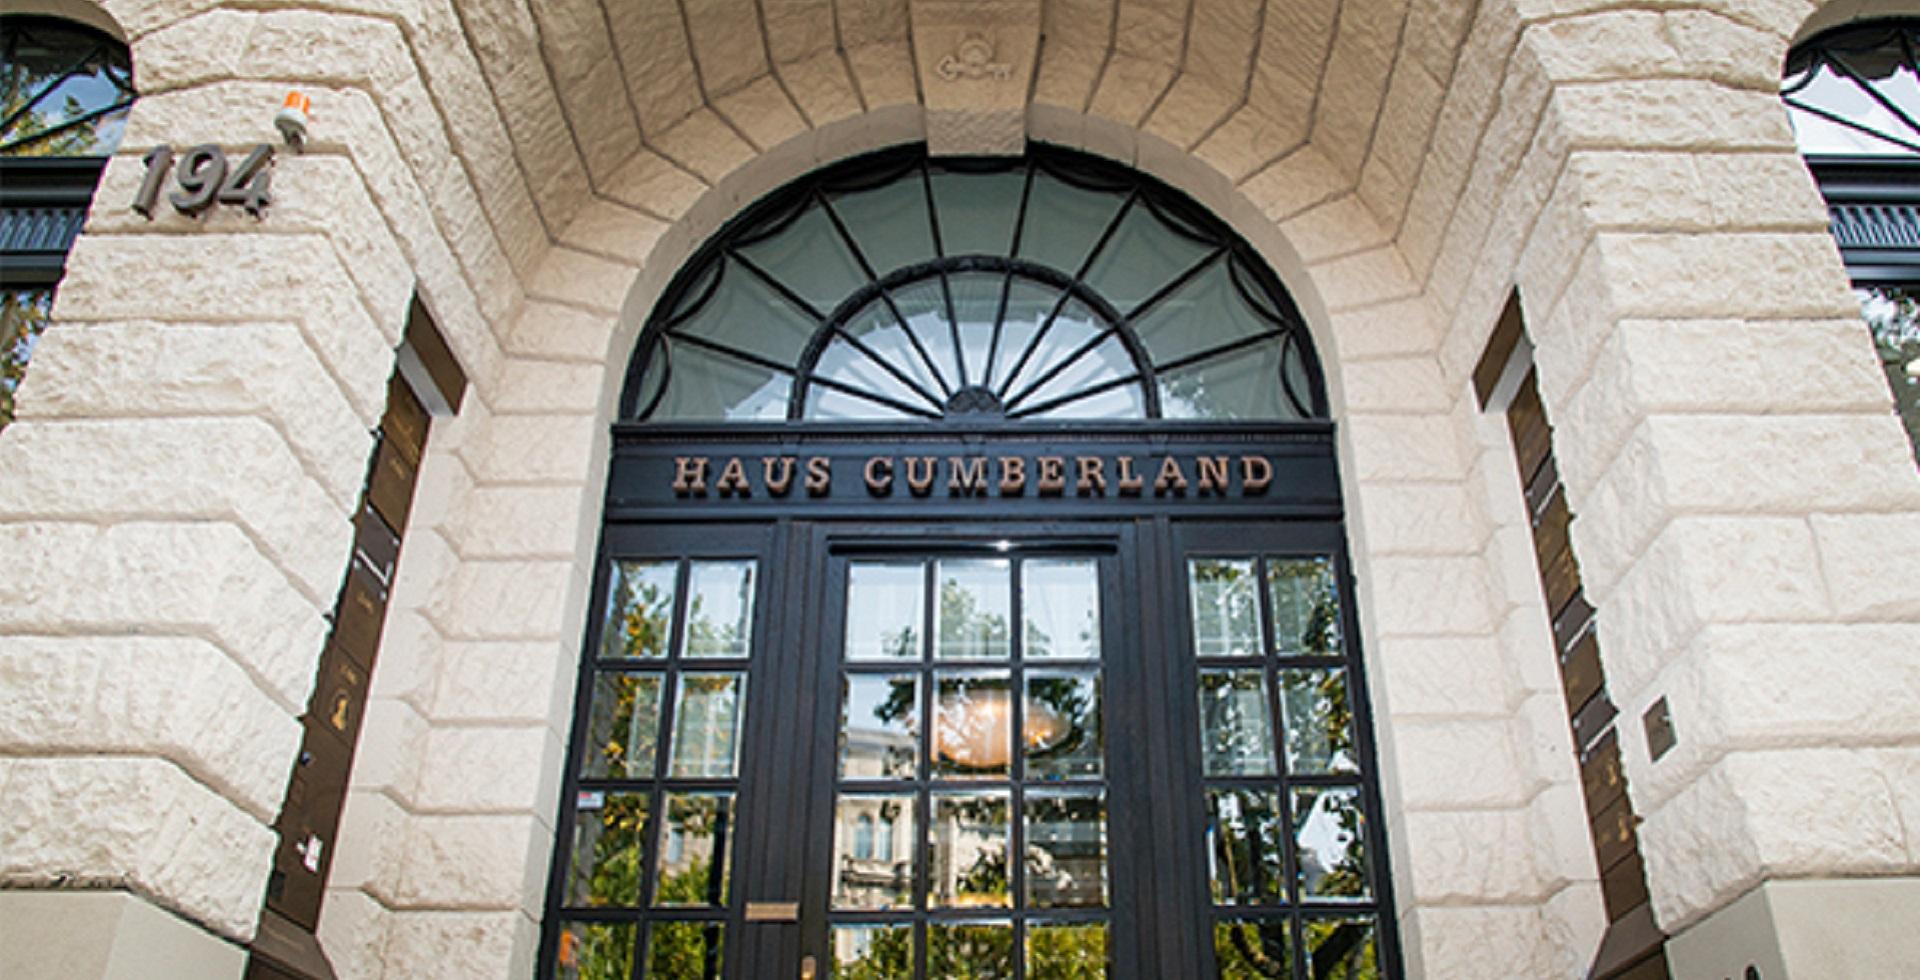 Cantera_Cucinelli_Berlin_Kurfuerstendamm_Haus-Cumberland